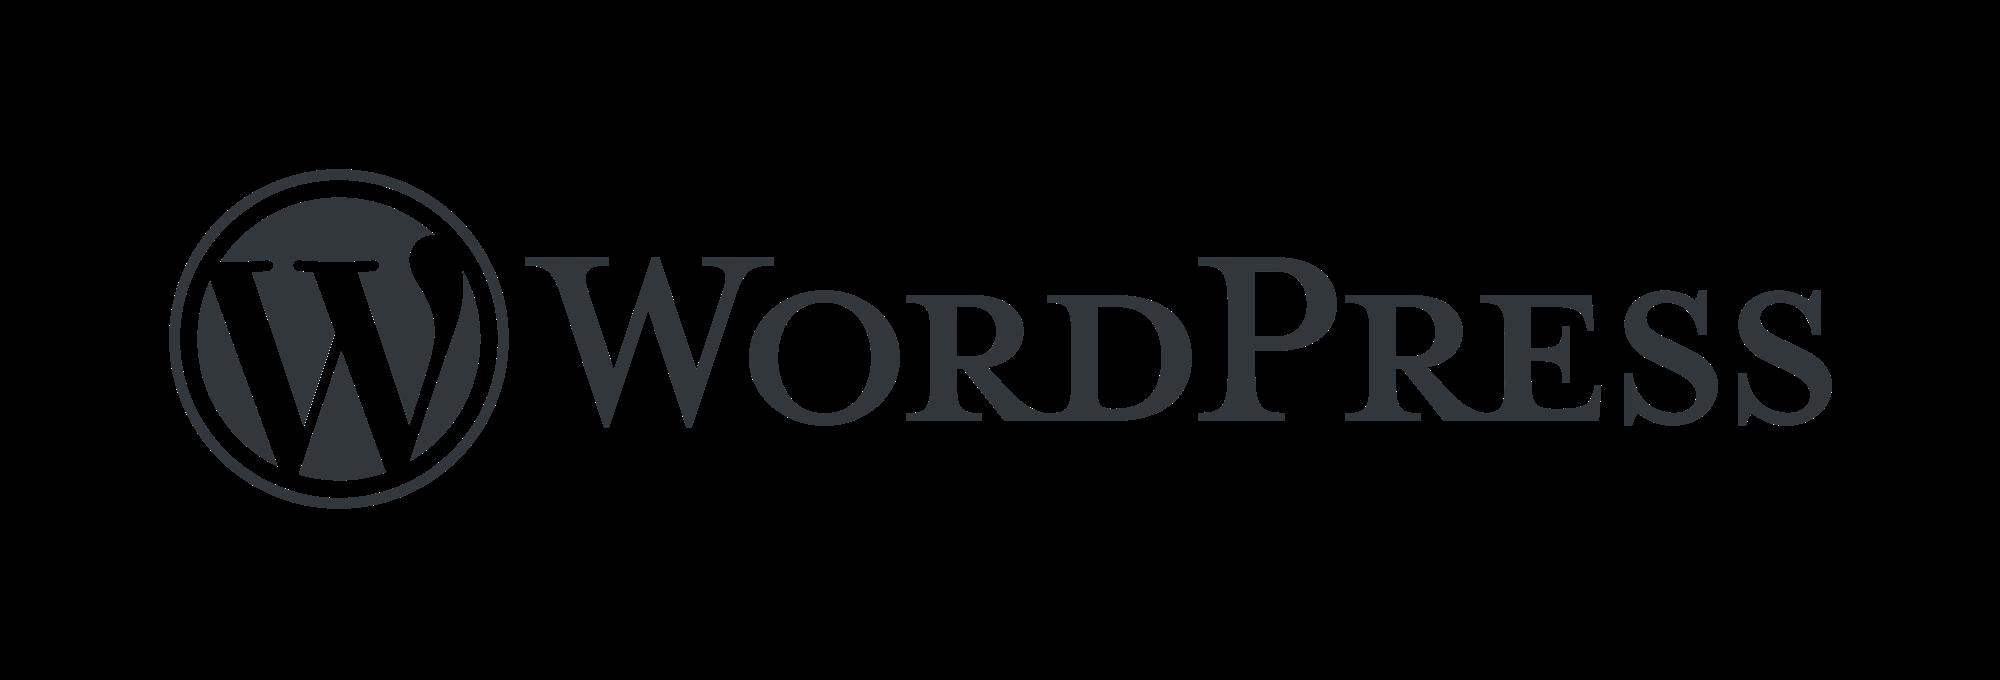 . PlusPng.com PNG (BaseGray/transparent) PlusPng.com  - Wordpress PNG